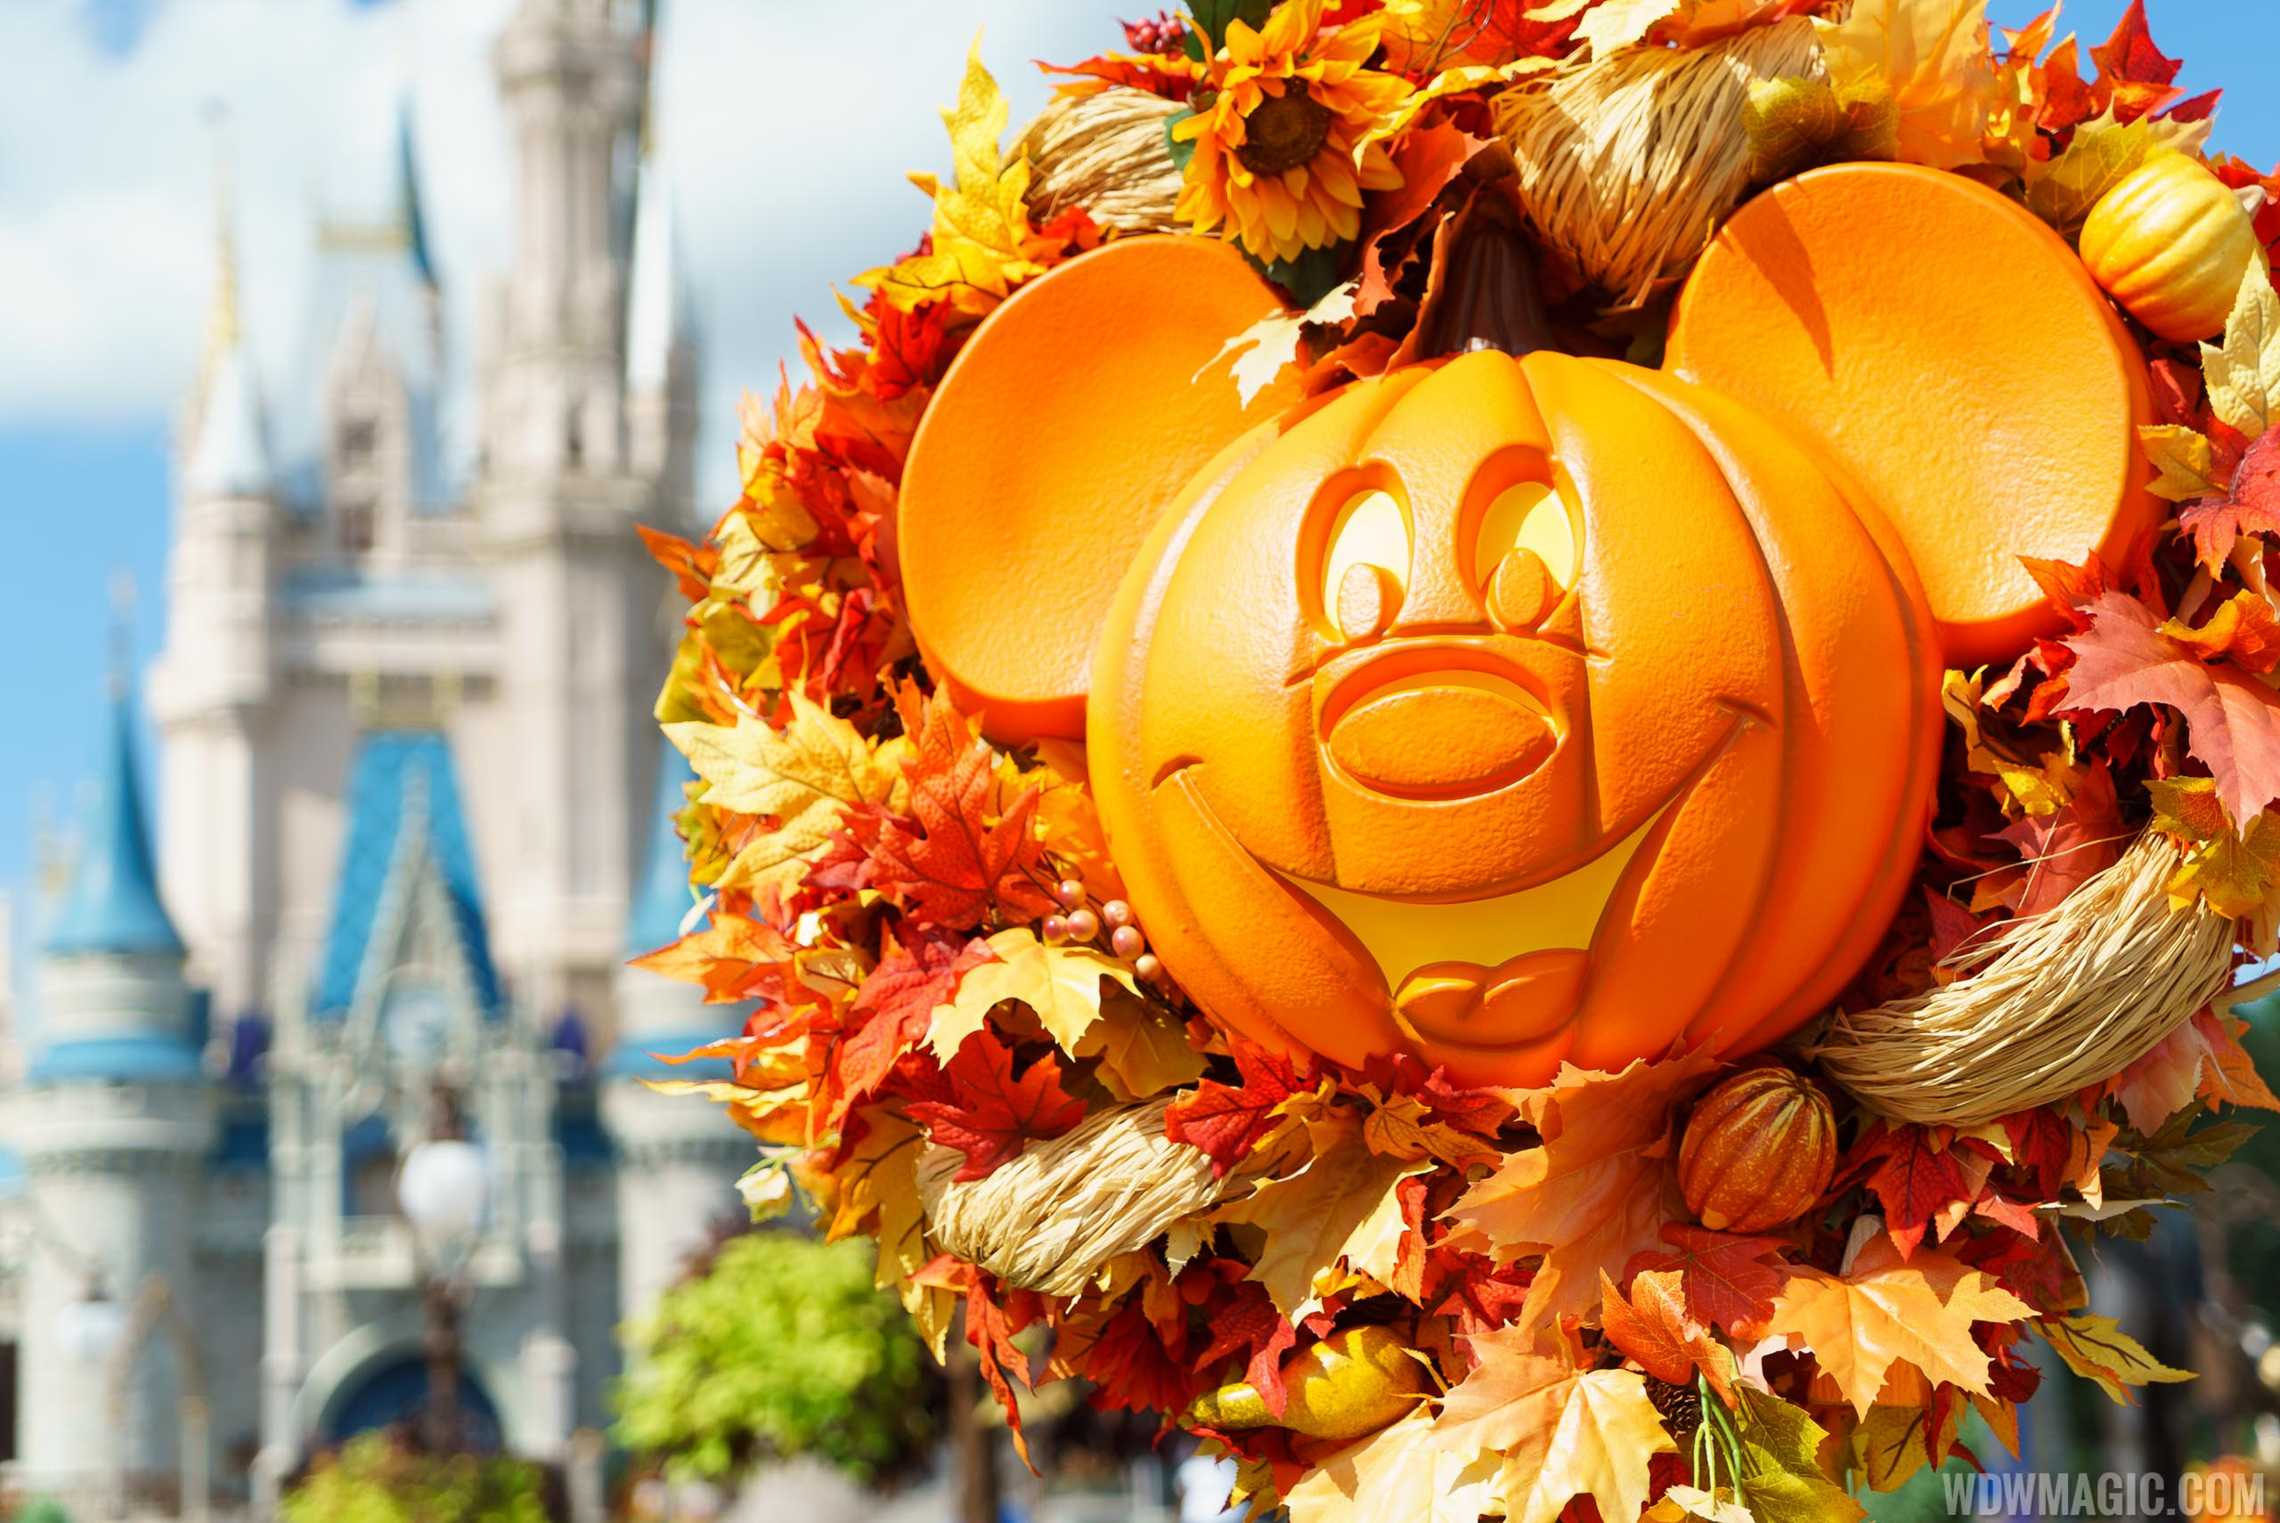 photos halloween decorations at the magic kingdom